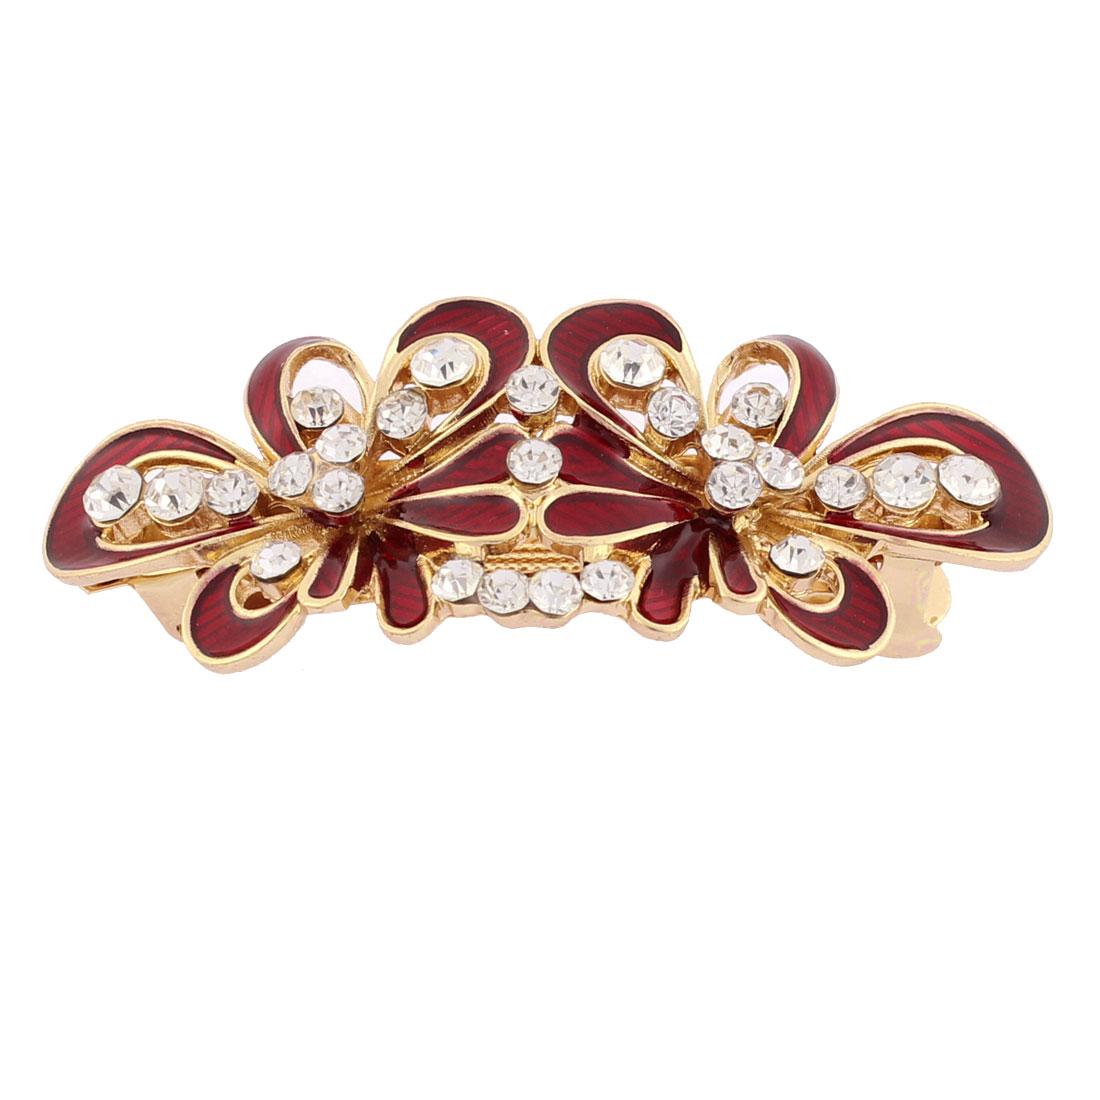 Lady Rhinestone Inlaid Flower Design French Barrette Hair Clip Gold Tone Red